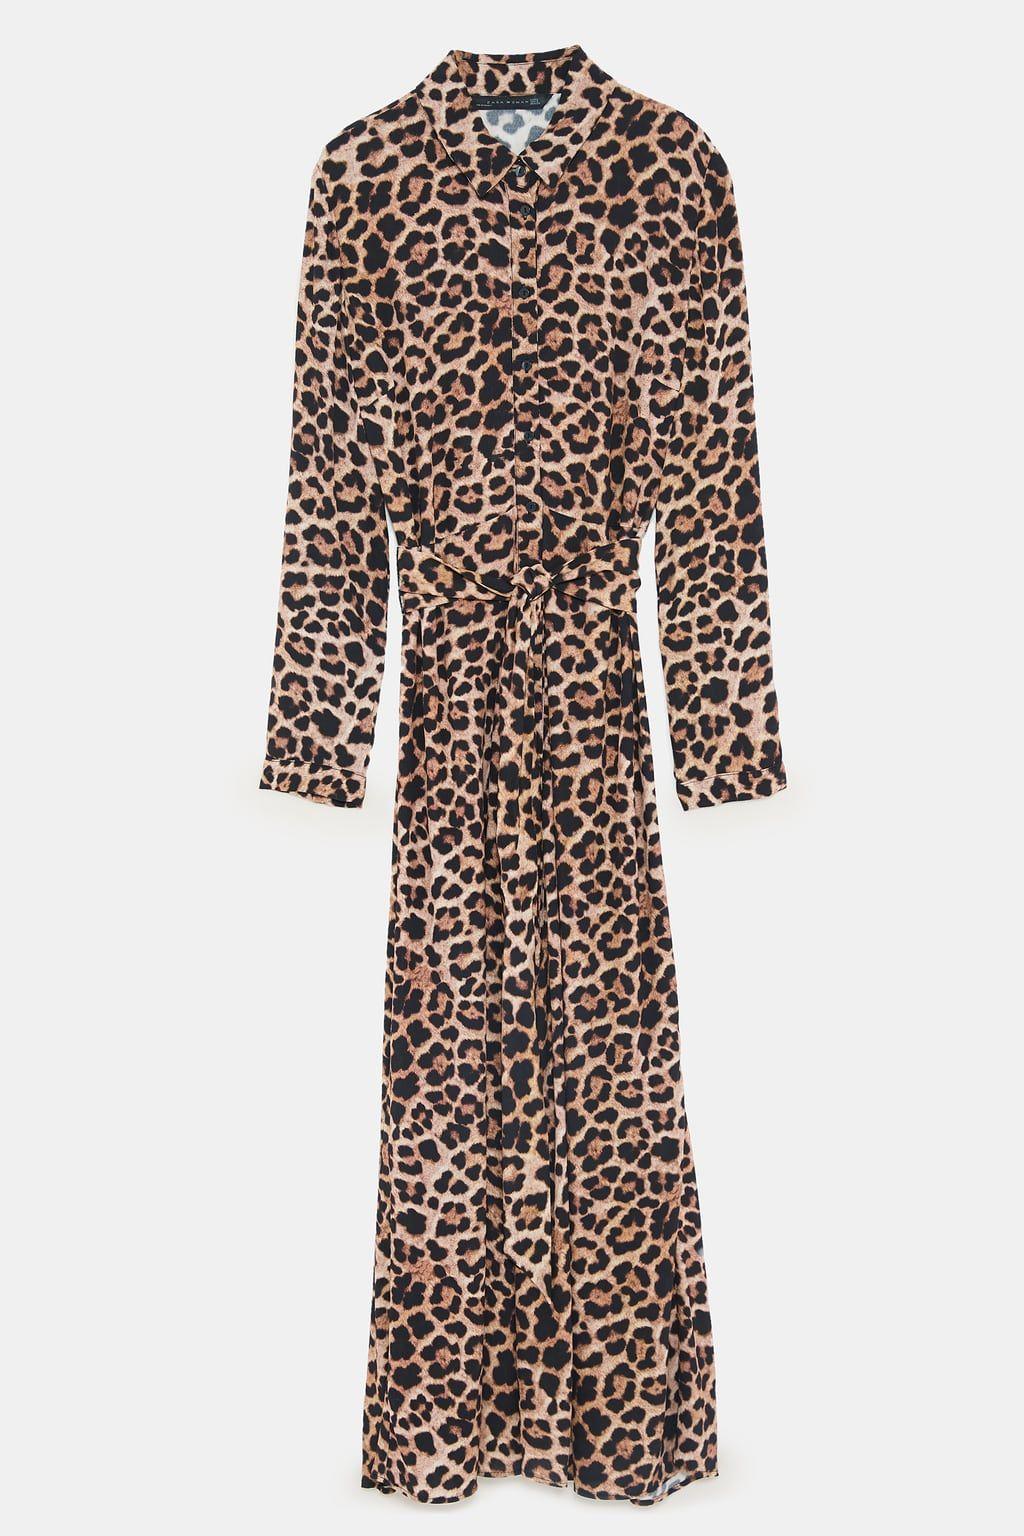 Image 8 Of Long Leopard Print Dress From Zara Print Maxi Dress Outfit Animal Print Shirt Dress Animal Print Maxi Dresses